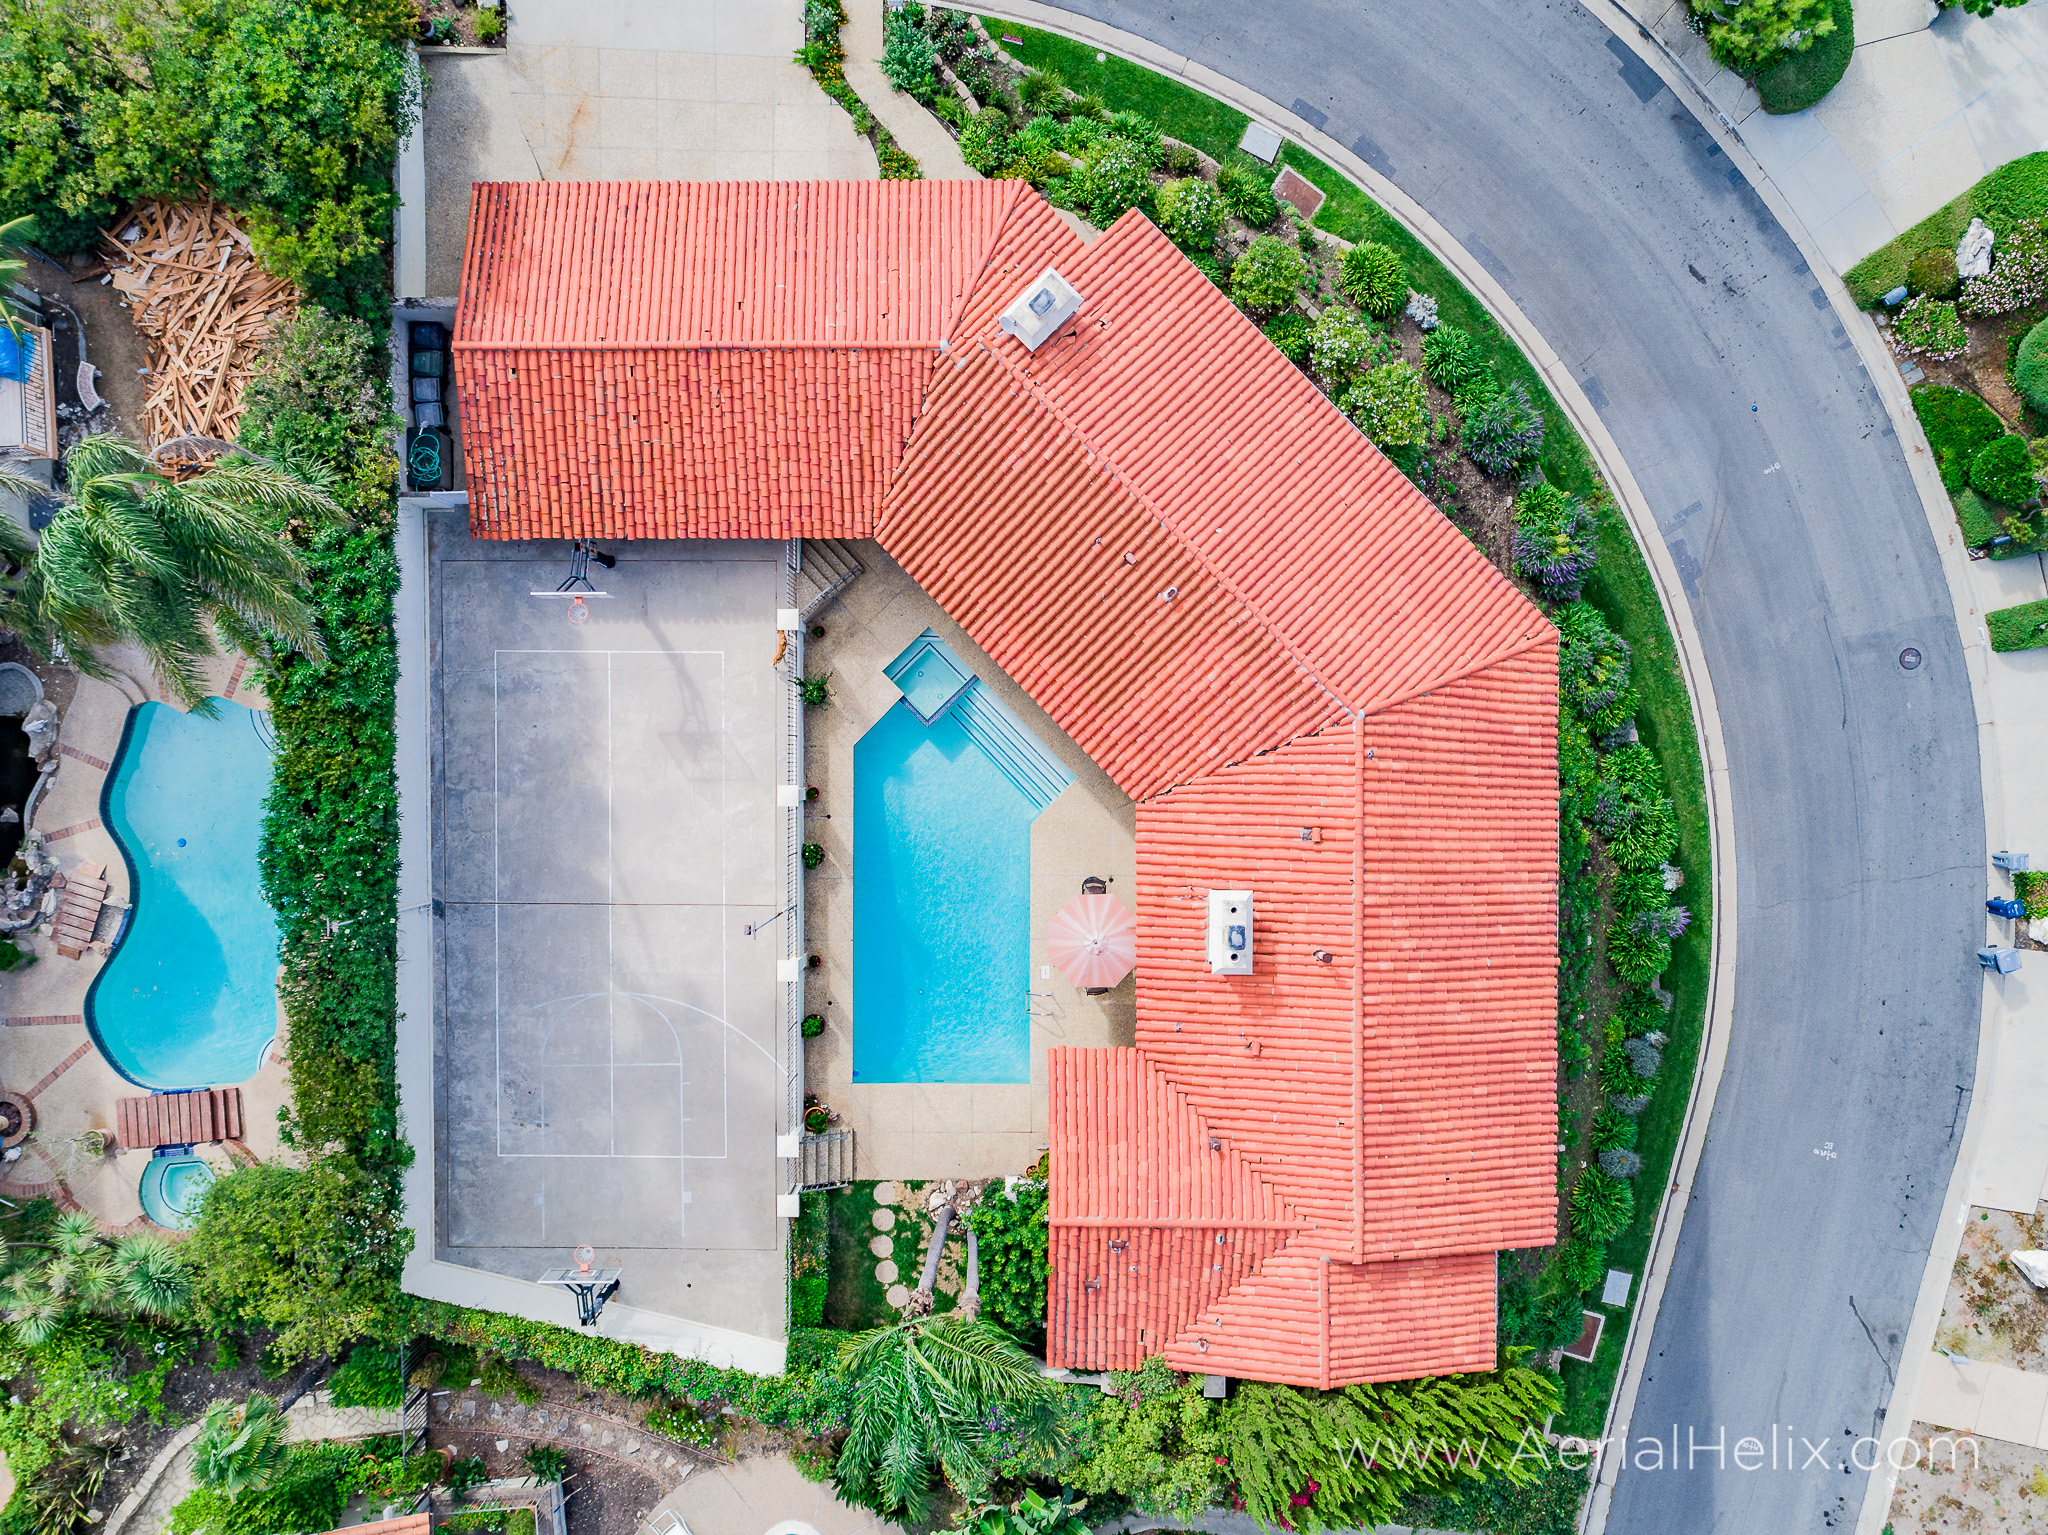 Woodfern Drive - HELIX Real Estate Aerial Photographer-5.jpg